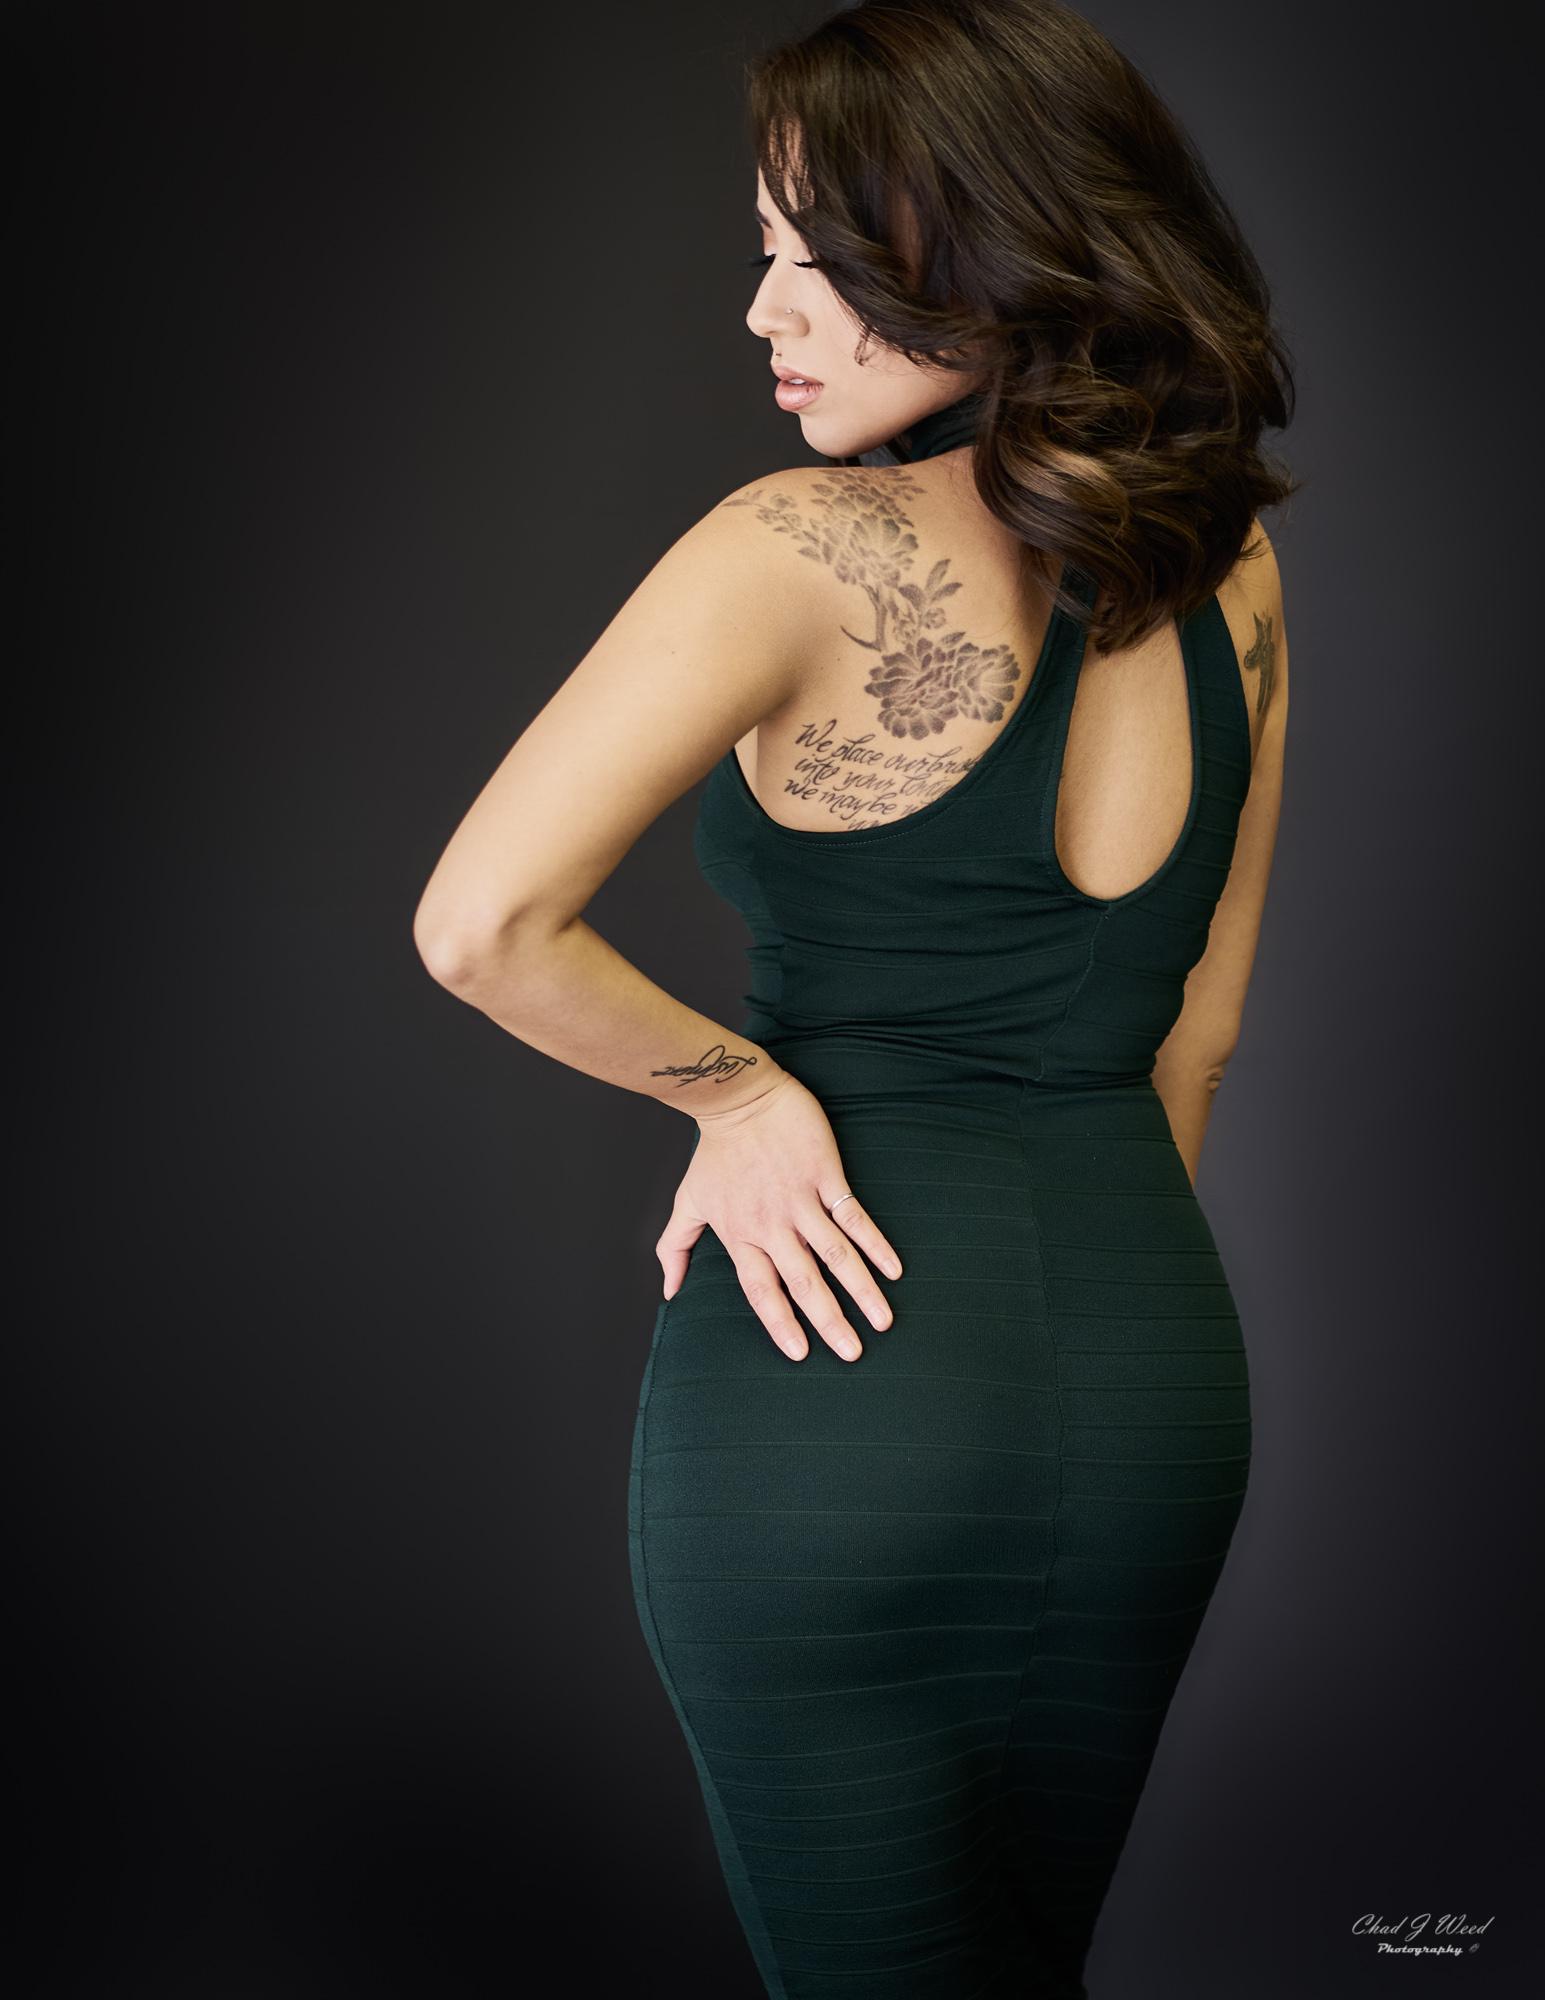 Carissa Elegant by Mesa Arizona Portrait Photographer Chad Weed